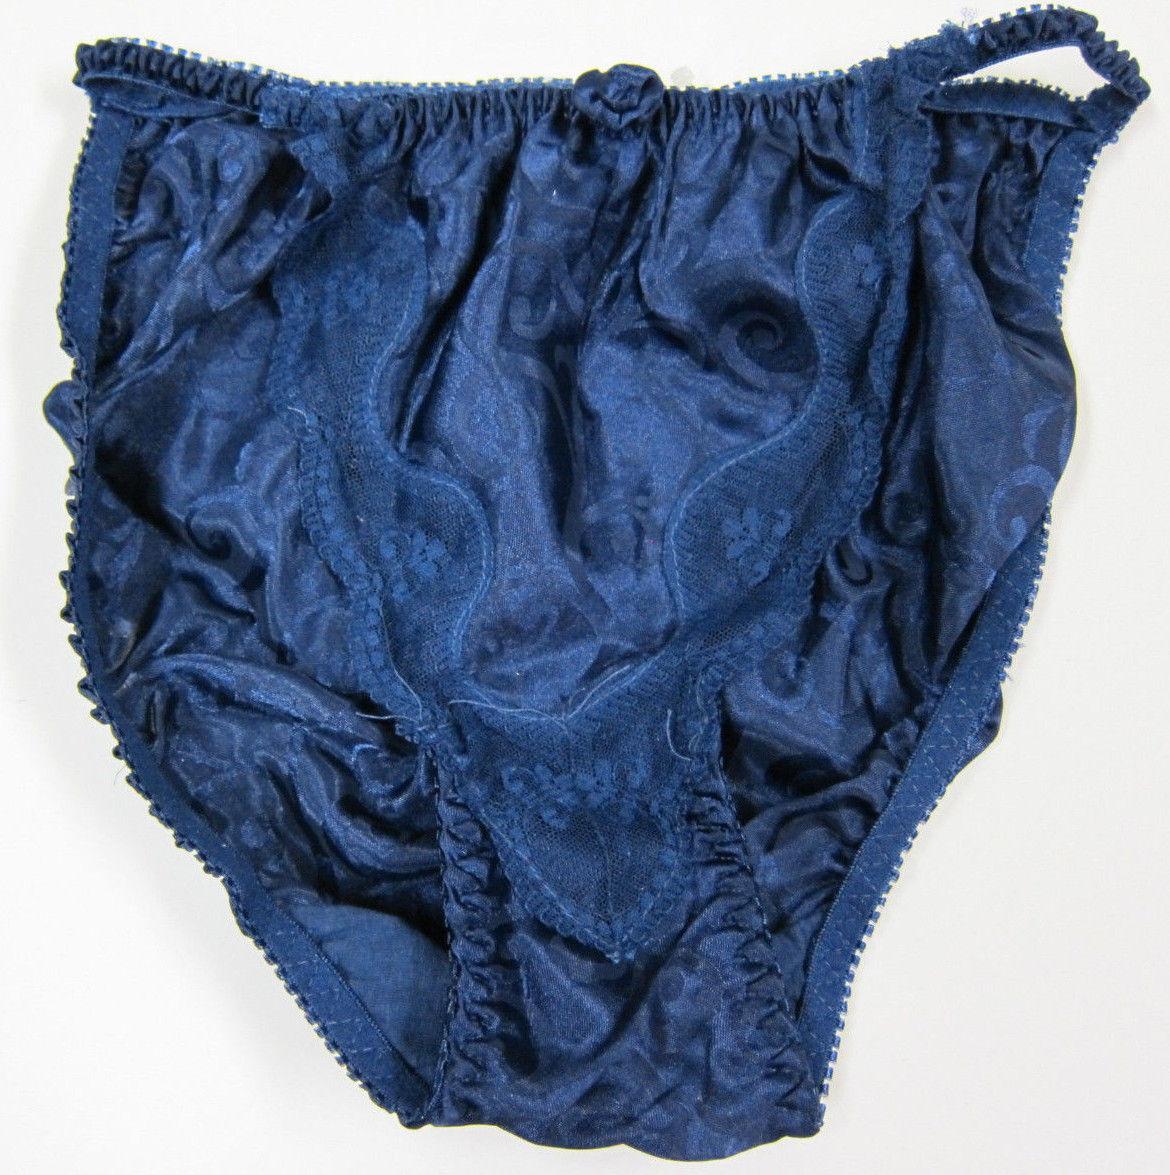 NEW VTG 100% Polyester Satin String Bikini Swirl Lace Panties SZ S 95b093096